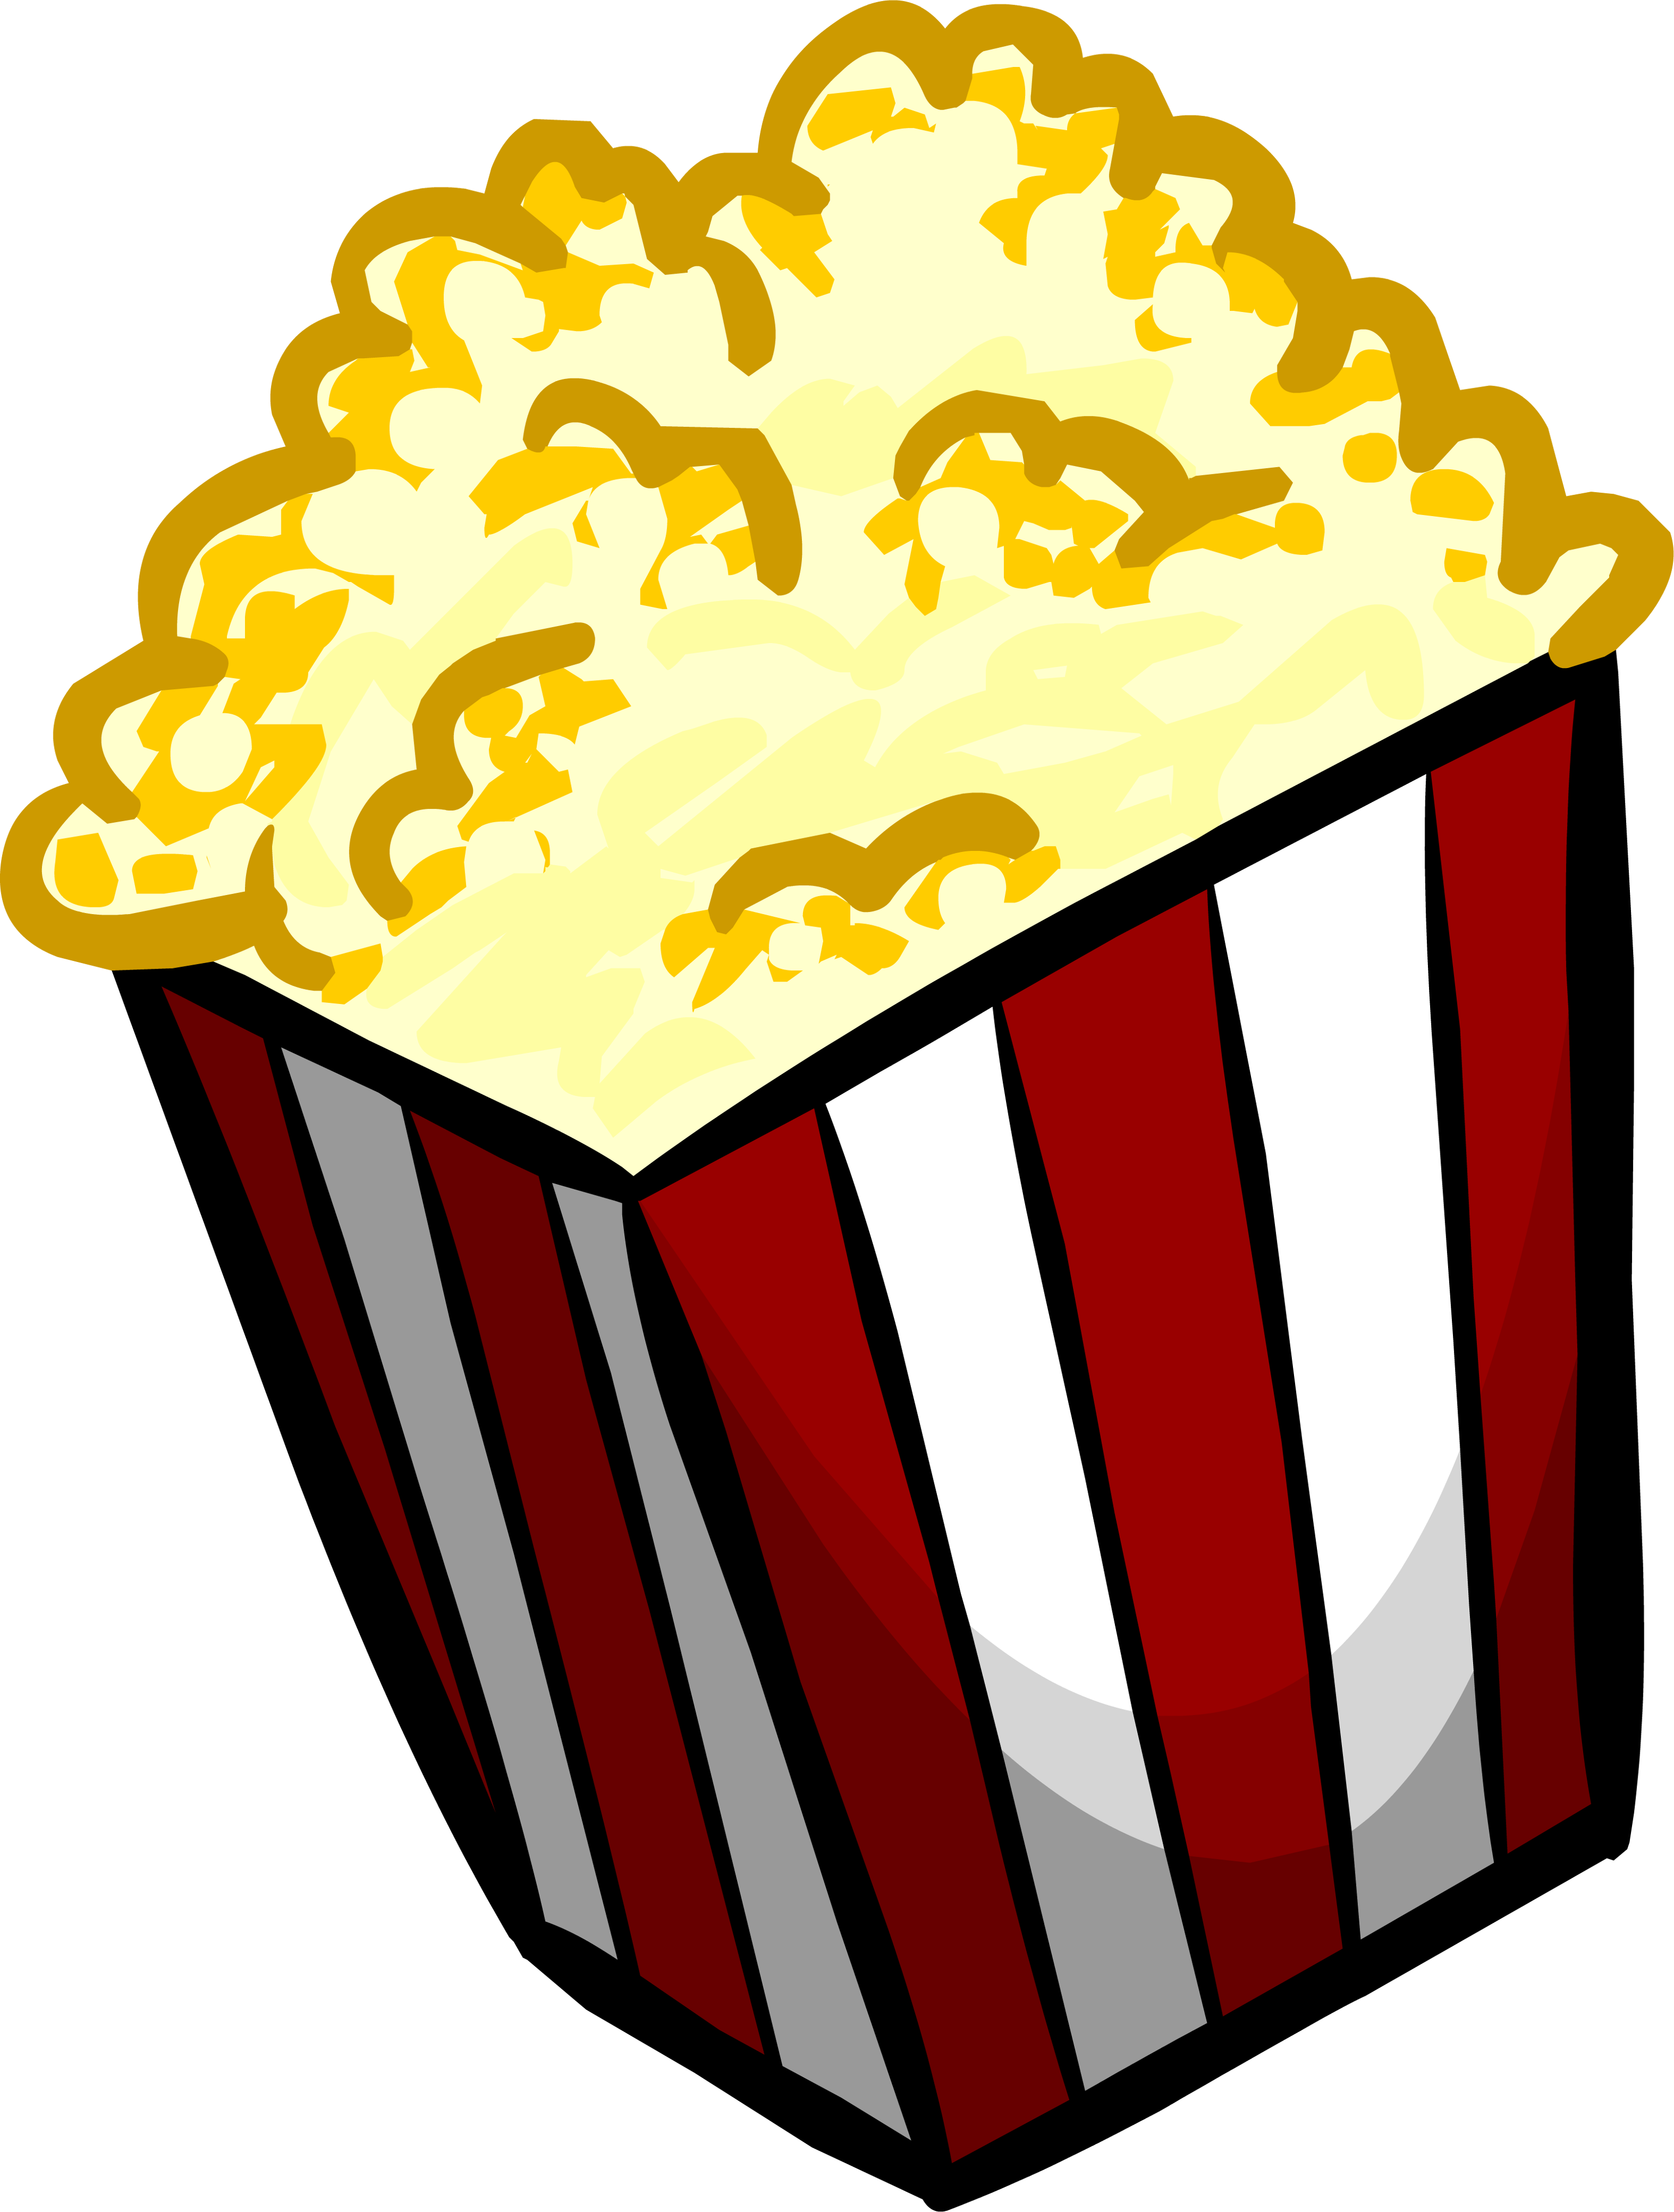 Ticket clipart popcorn. Download free png transparent